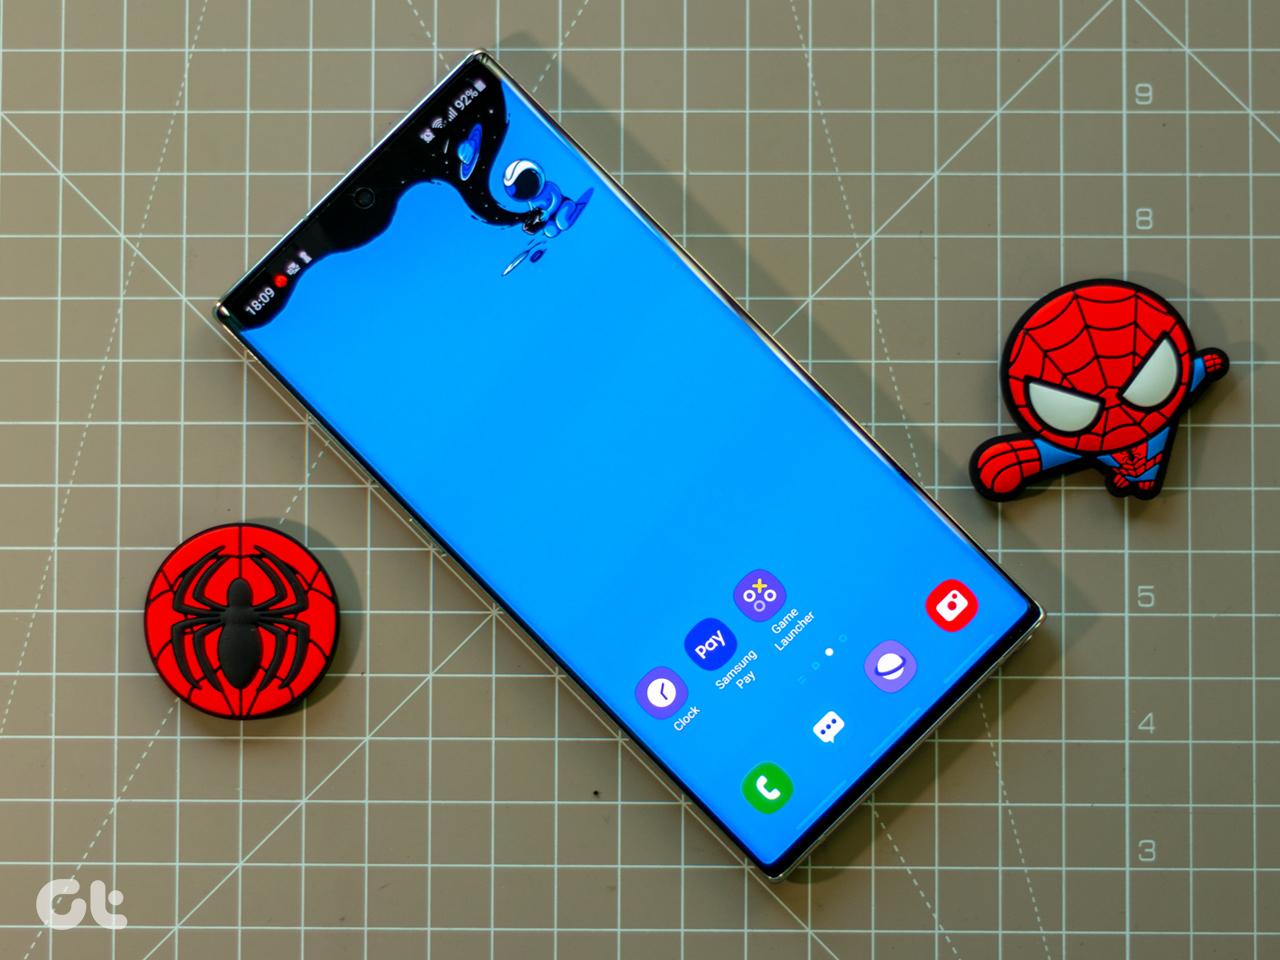 11 paras samsung Galaxy Note        10 ja yli 10 …